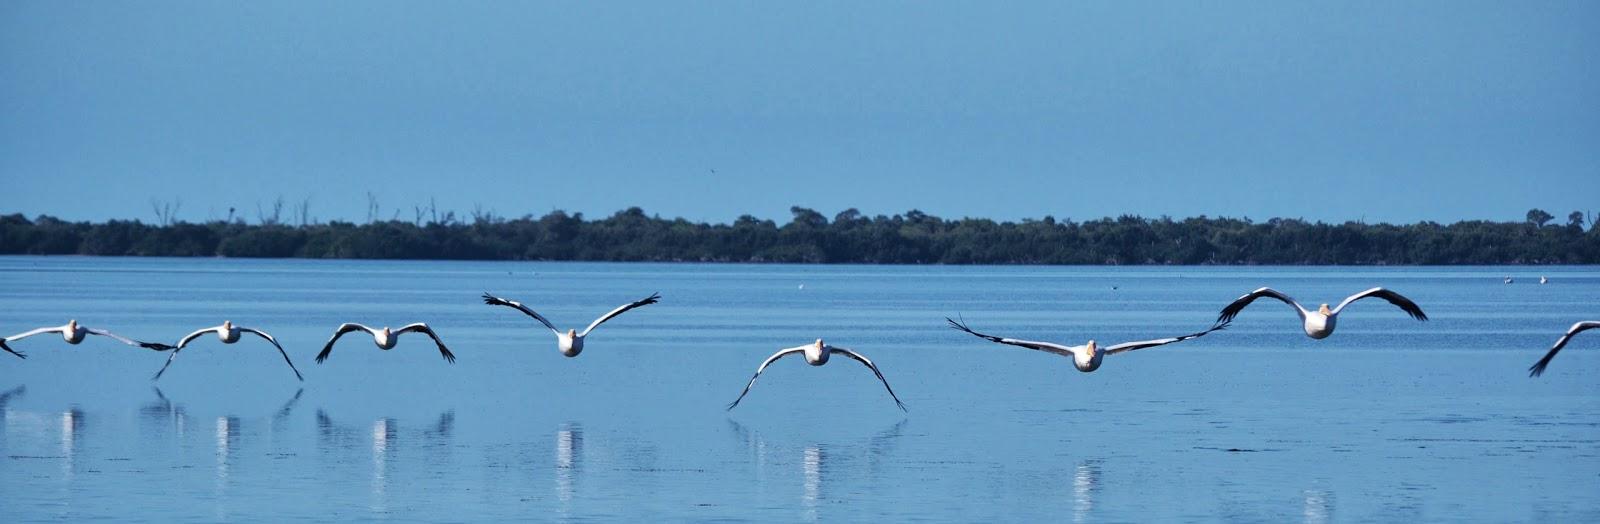 Pine Island Florida Weather January